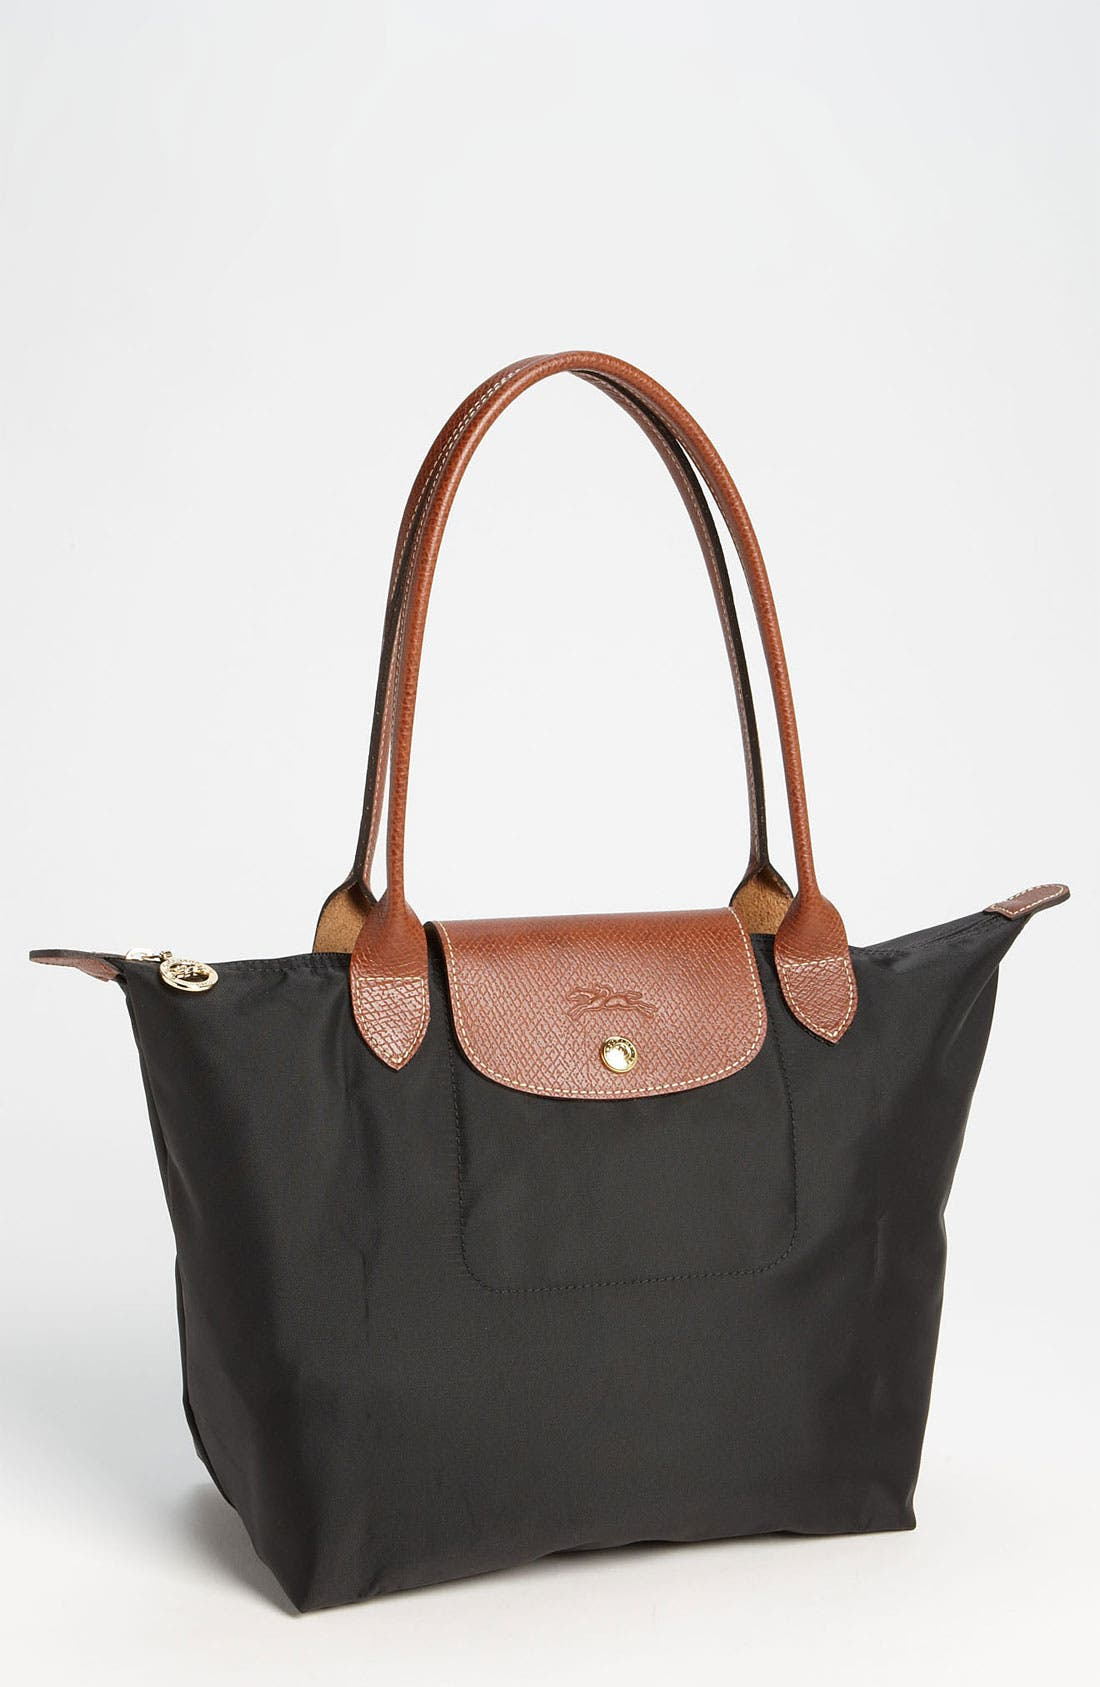 longchamp u0027small le pliageu0027 shoulder tote - Travel Tote Bags